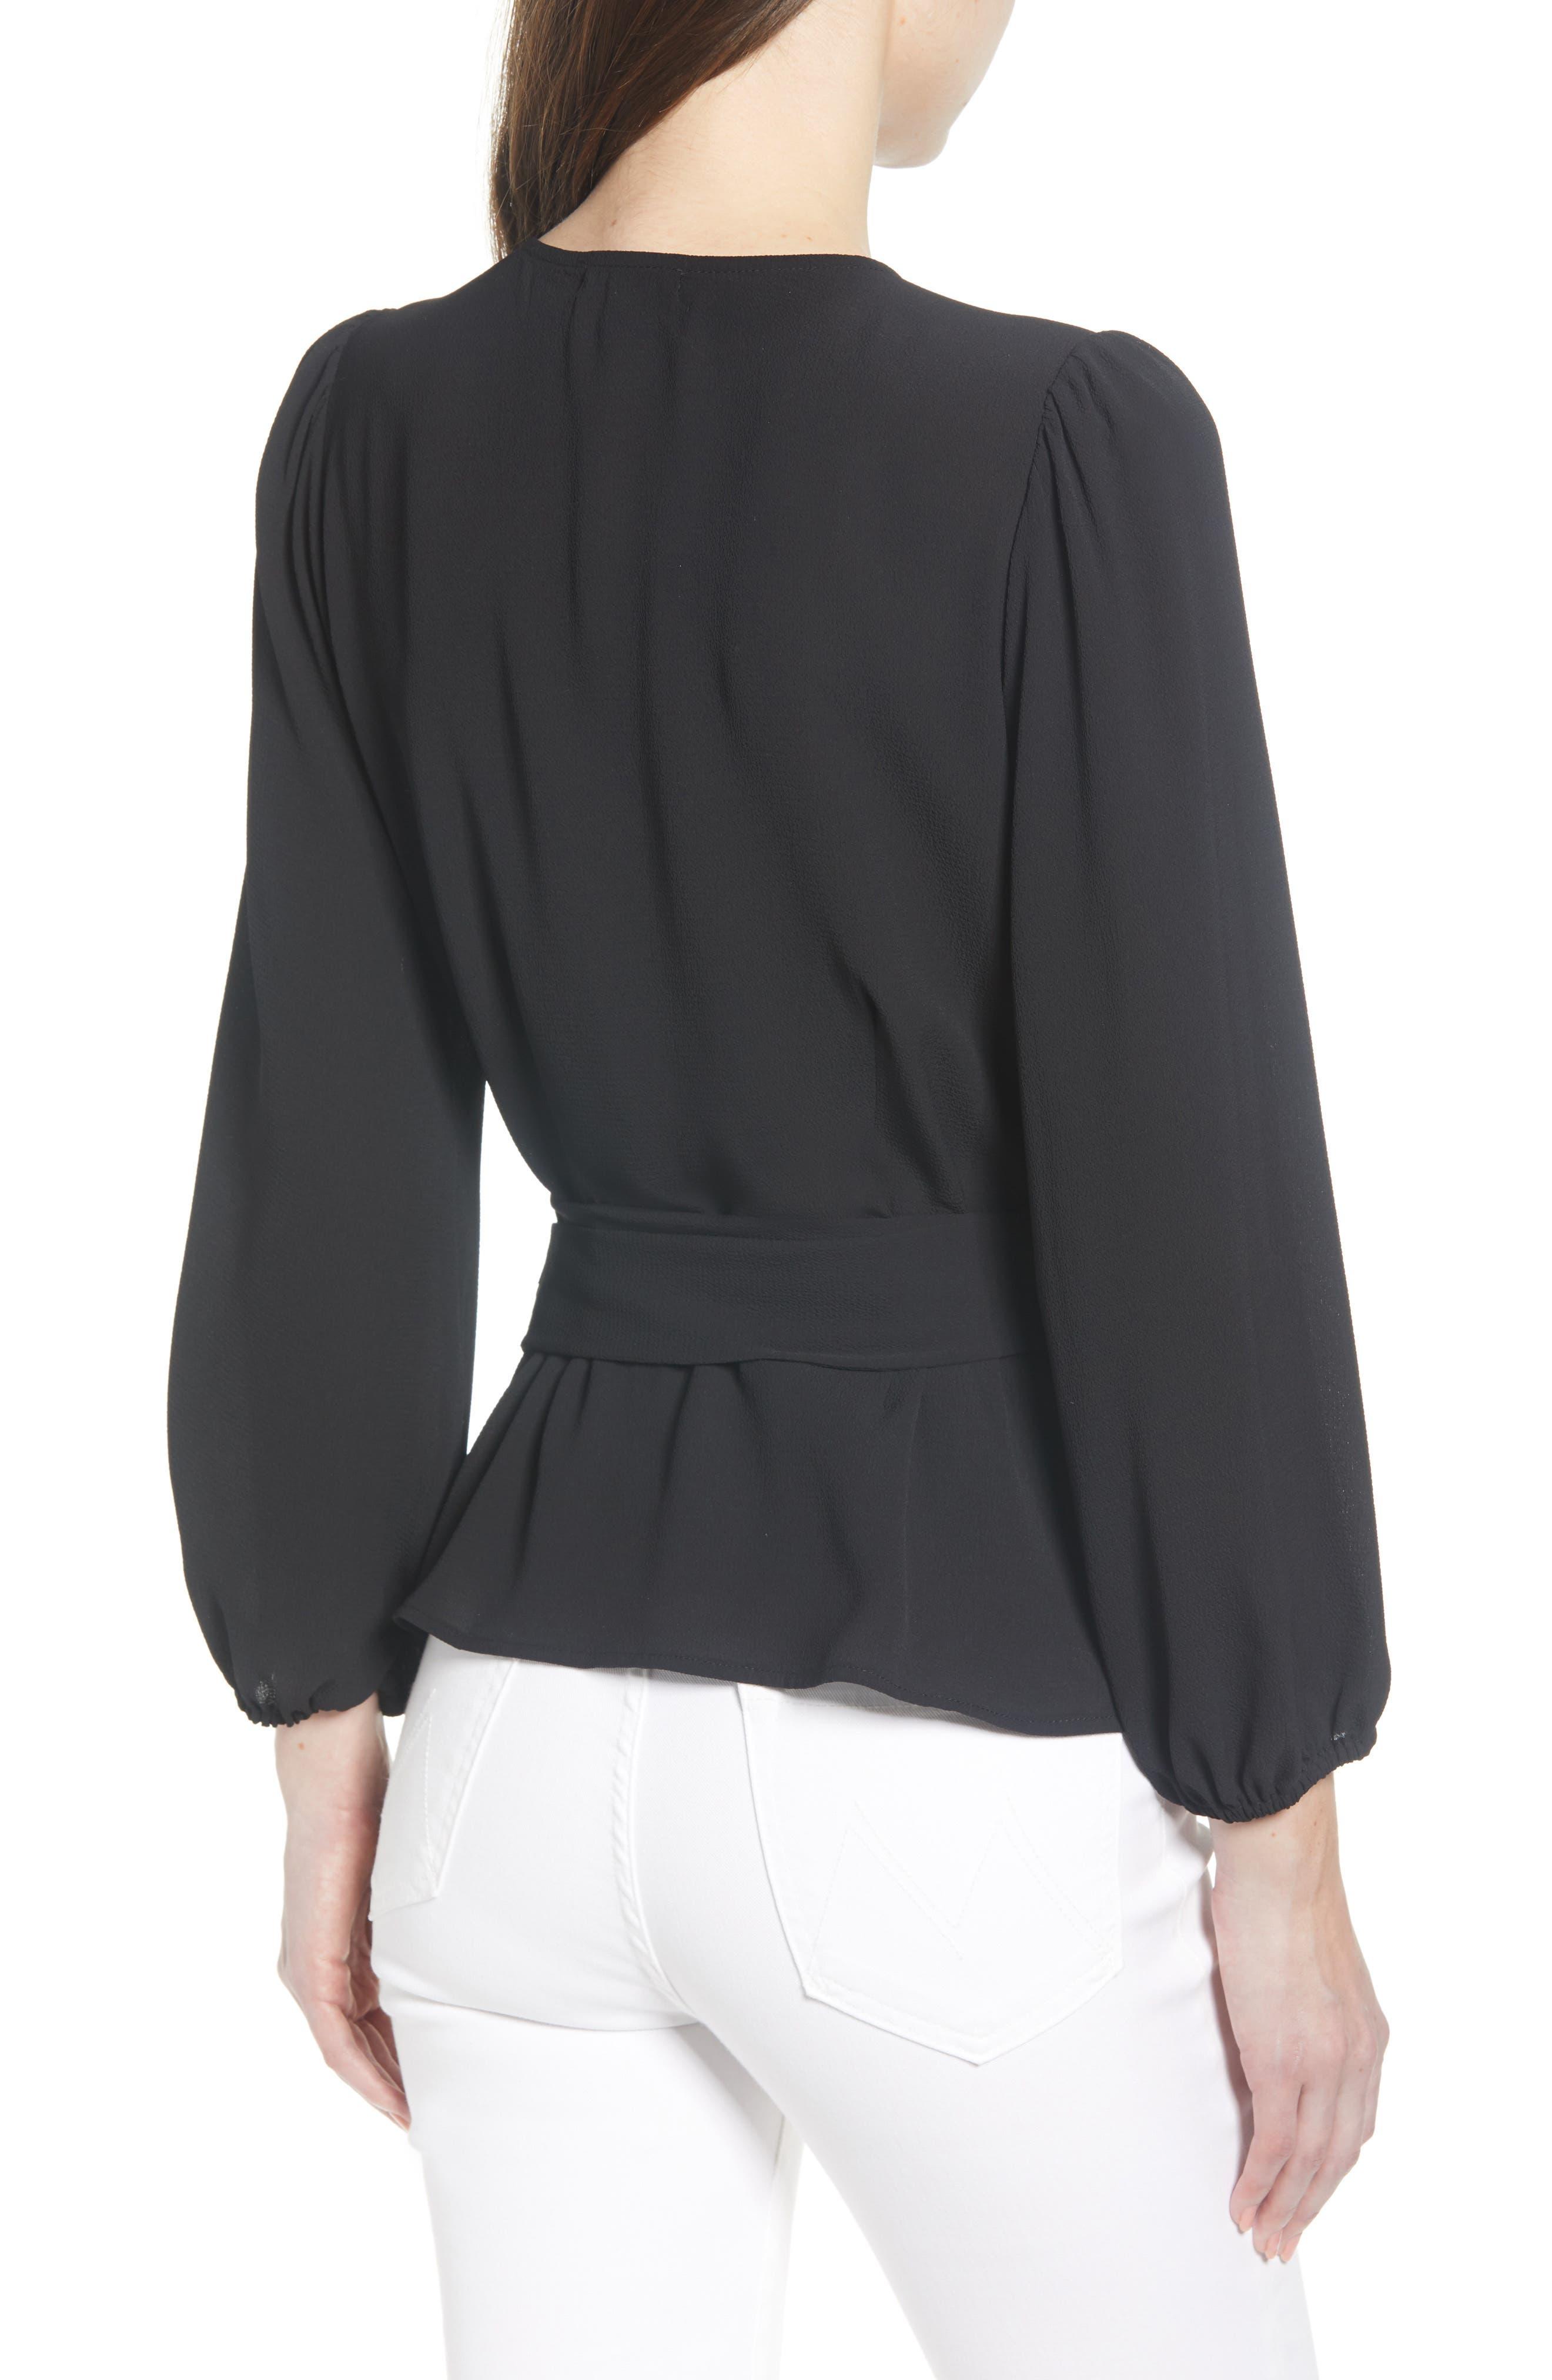 95bad7da0c642 New Women s Clothing